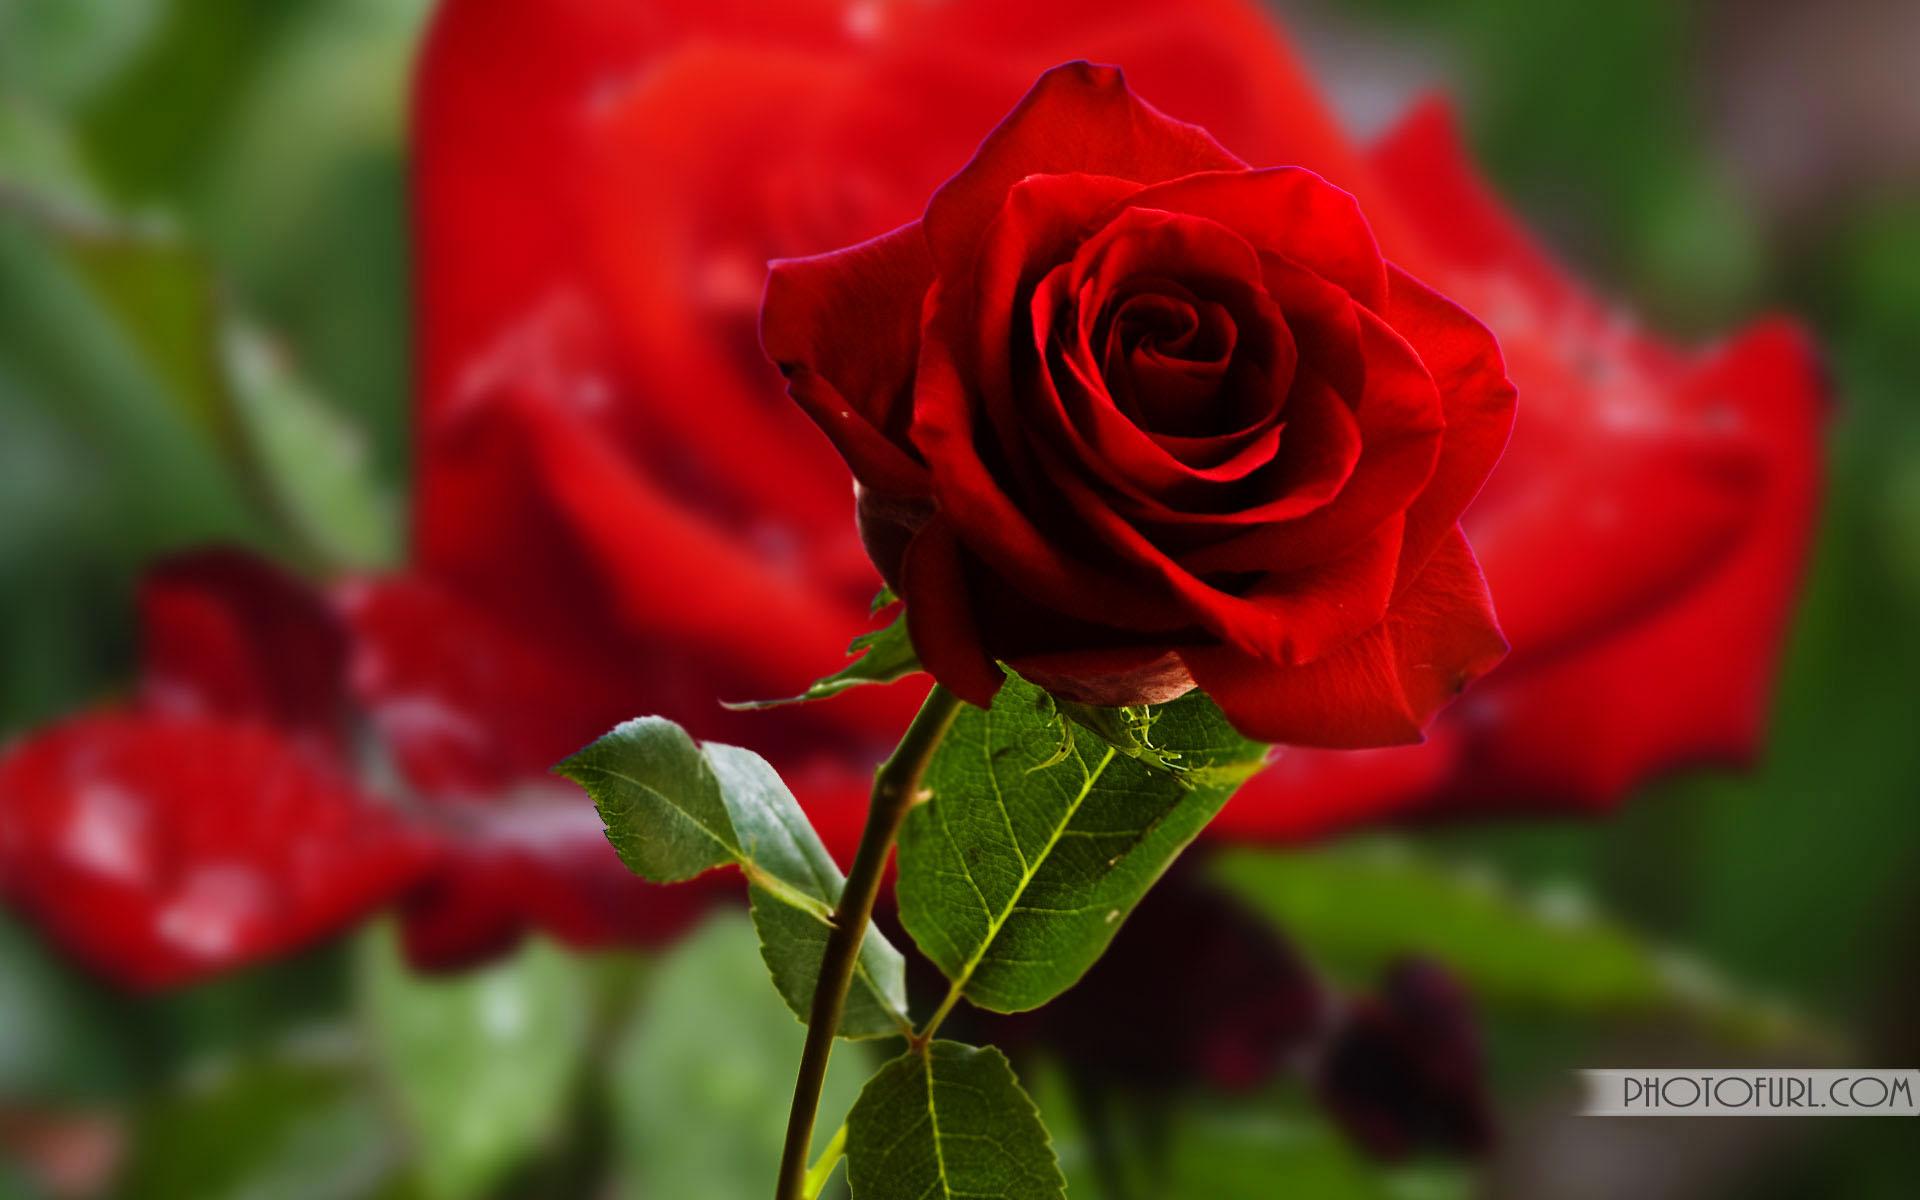 50+ Most Beautiful Rose Flowers Wallpapers on WallpaperSafari